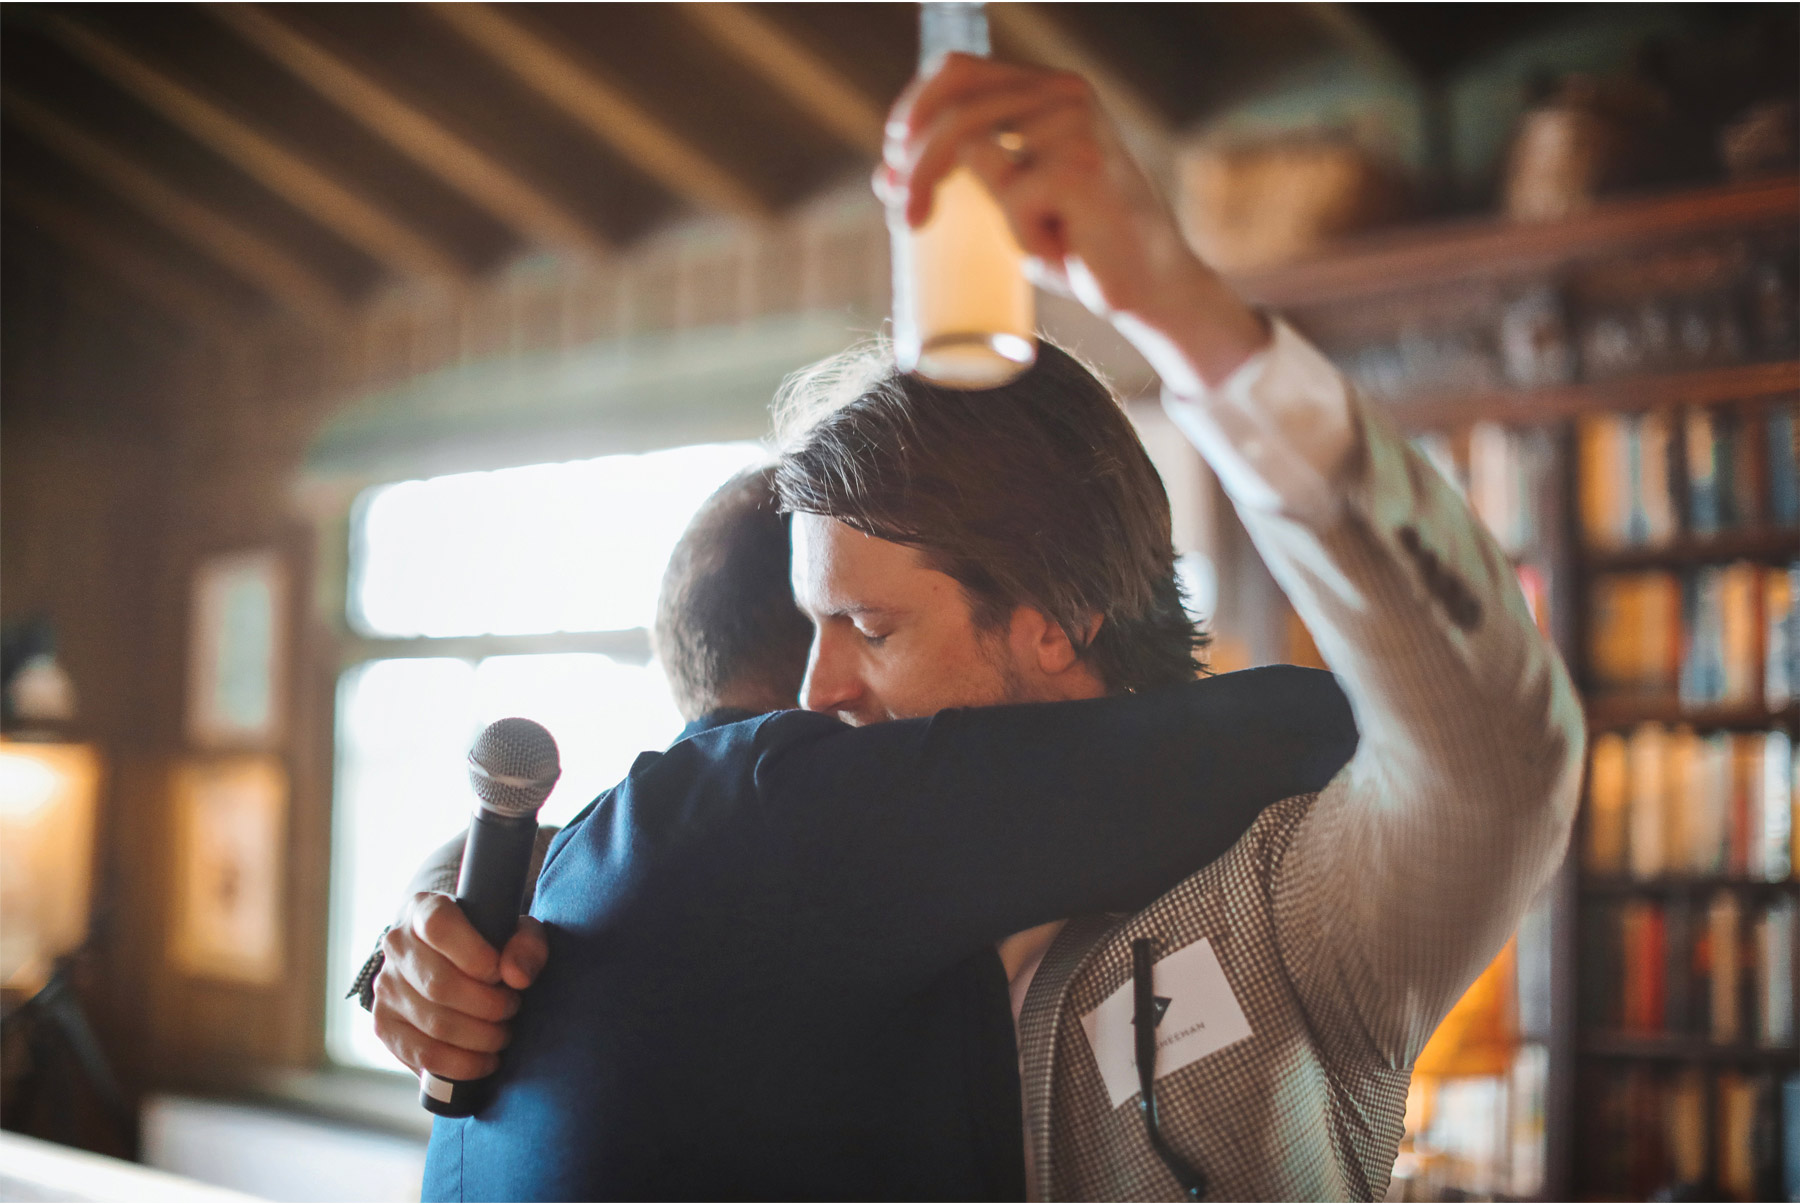 03-Vick-Photography-Wedding-Stouts-Island-Lodge-Wisconsin-Summer-Toast-Hug-MiJa-and-Lucius.jpg